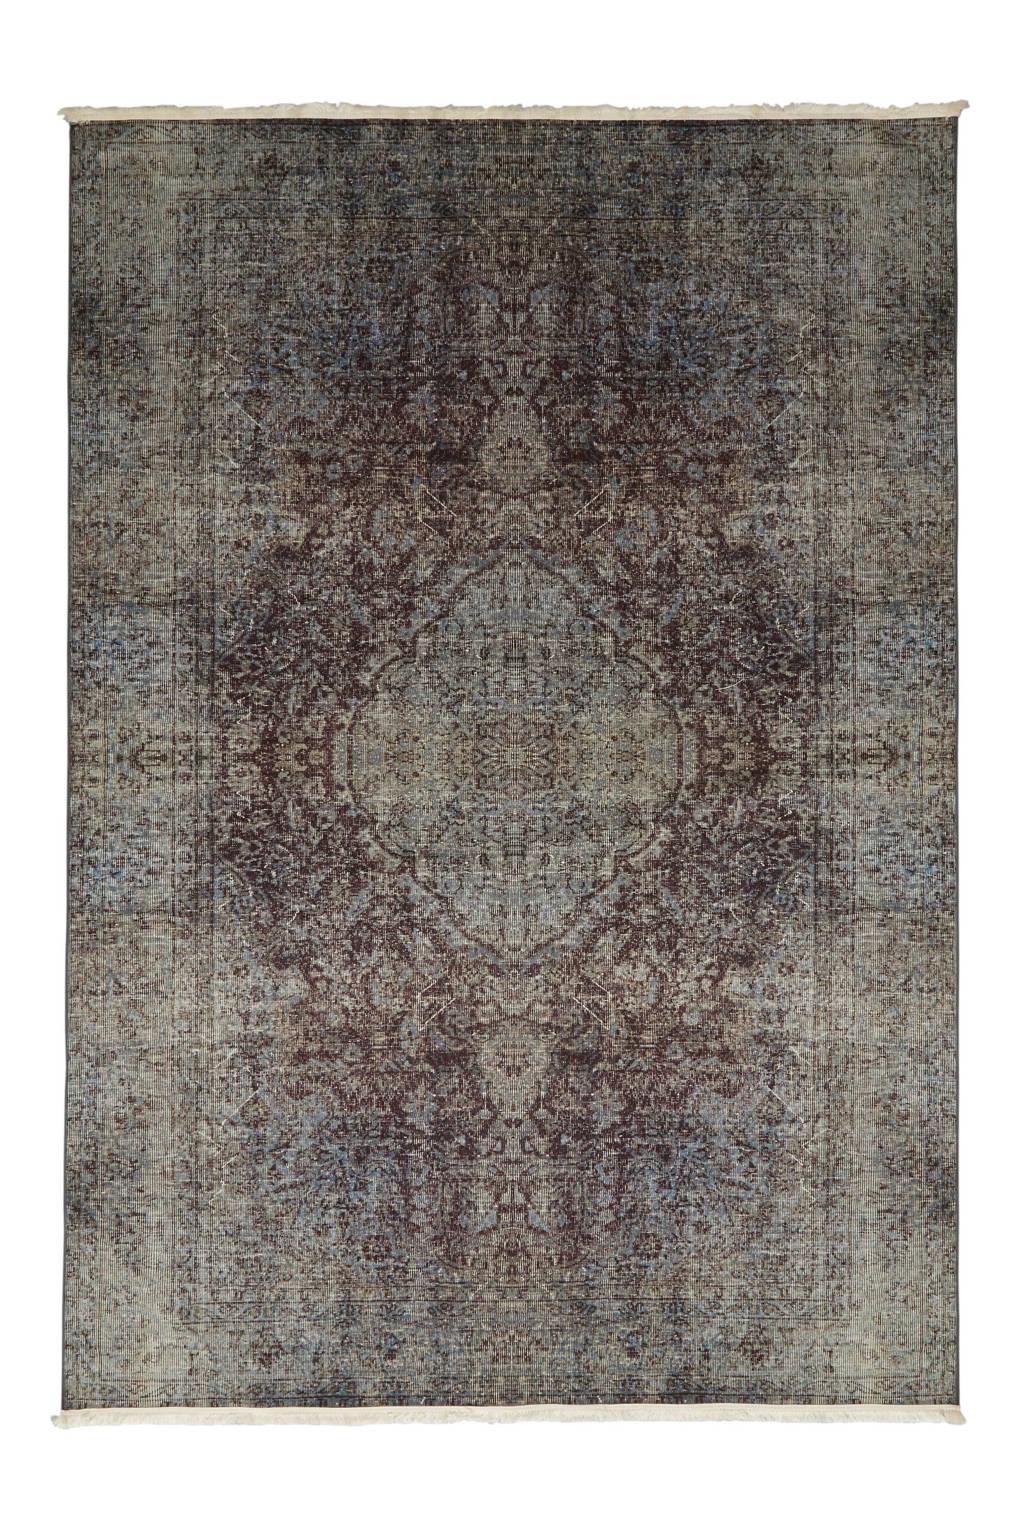 Vloerkleed Palmier  (230x160 cm)